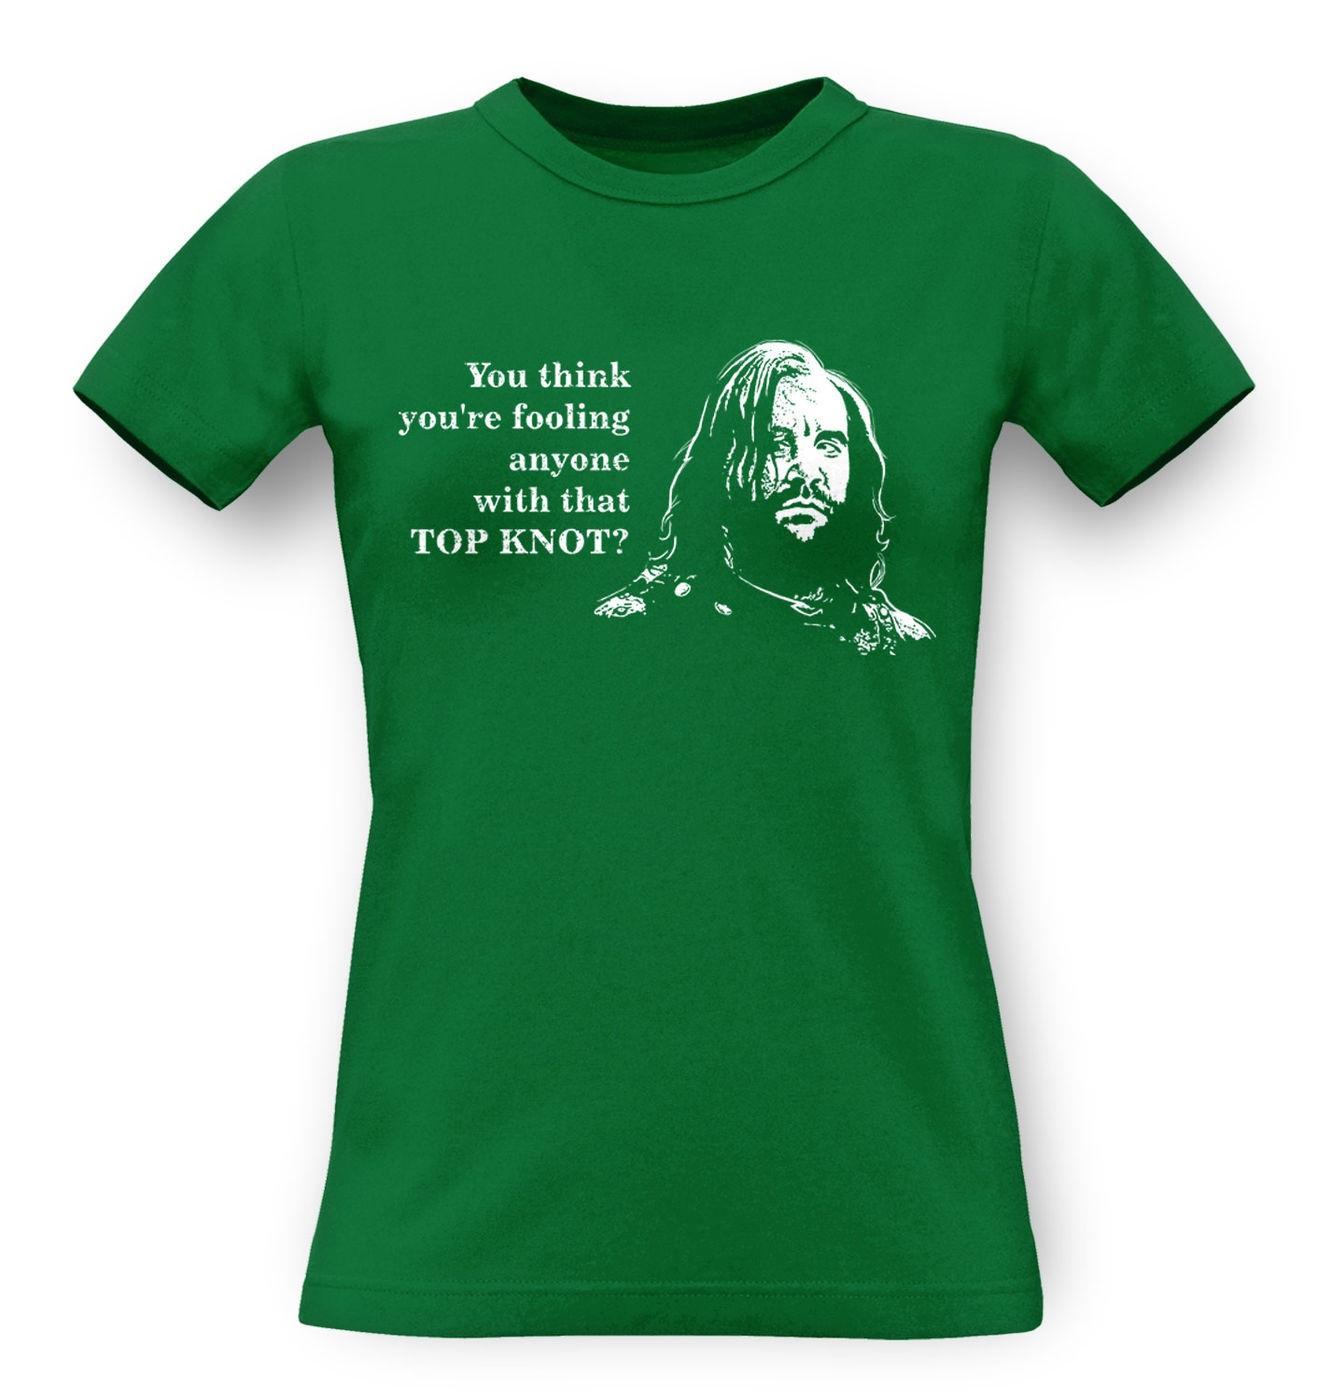 Boycott Top Knot classic womens t-shirt by Something Geeky